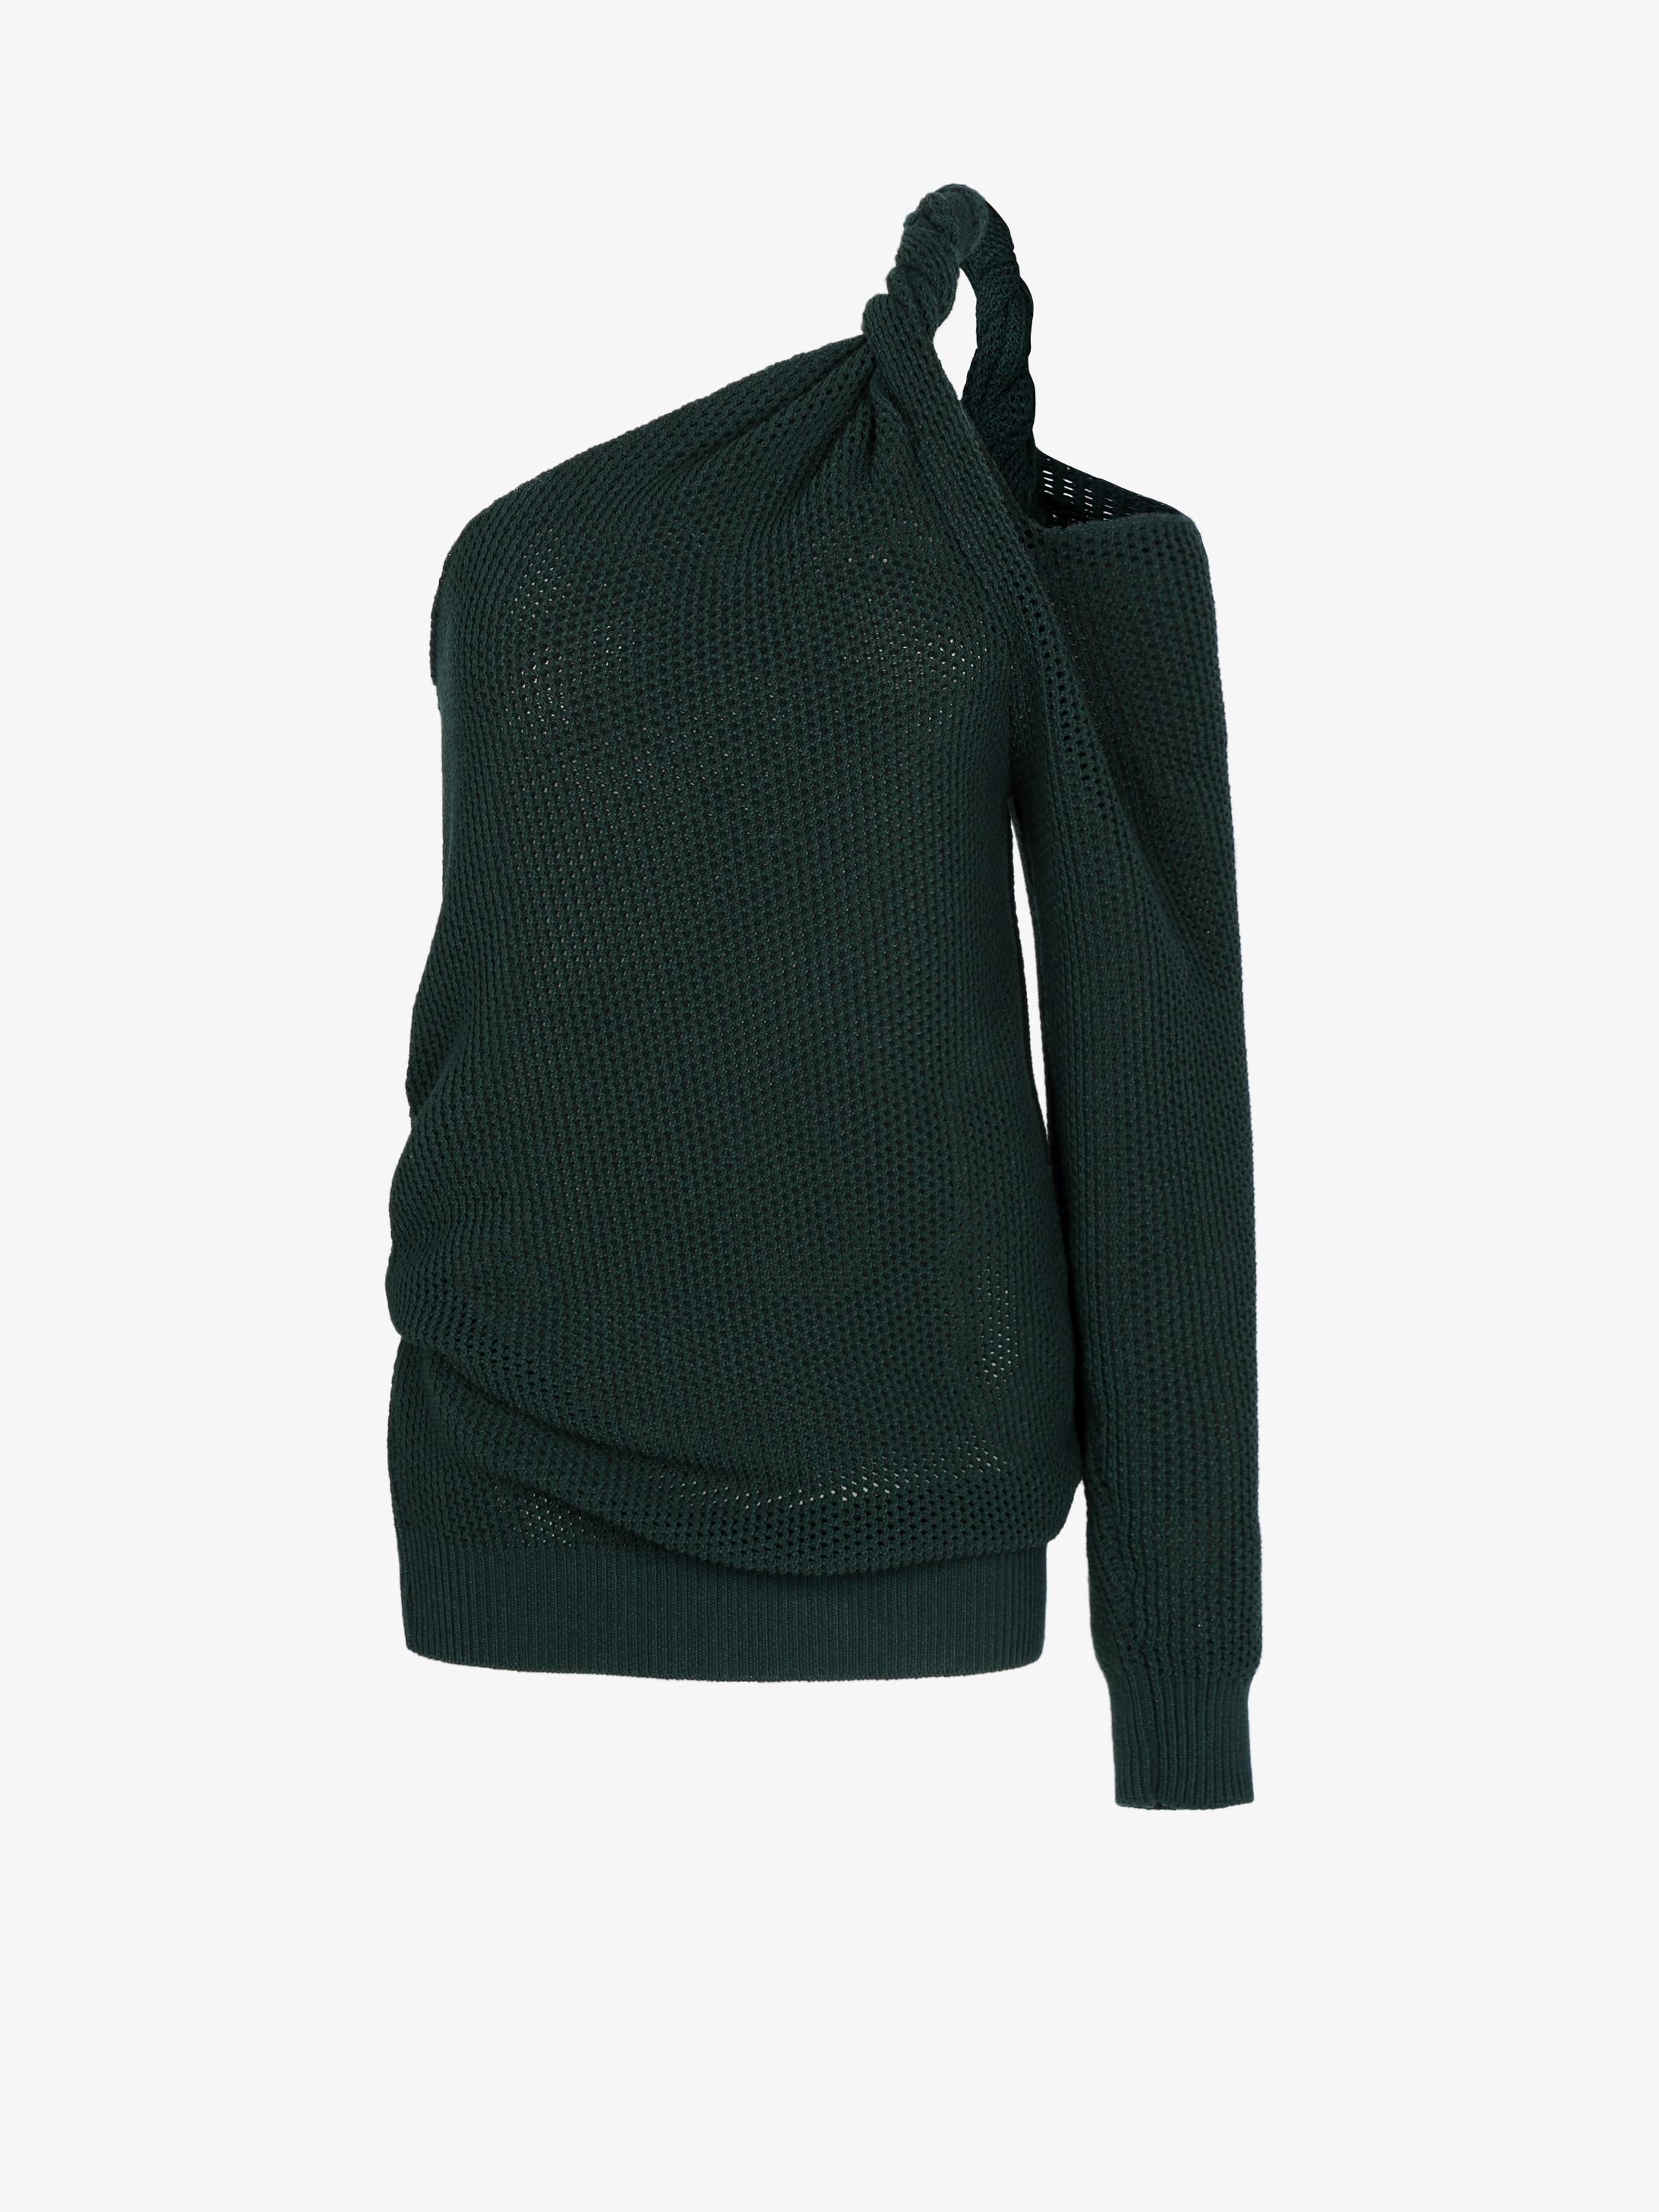 Asymmetrical top in mesh